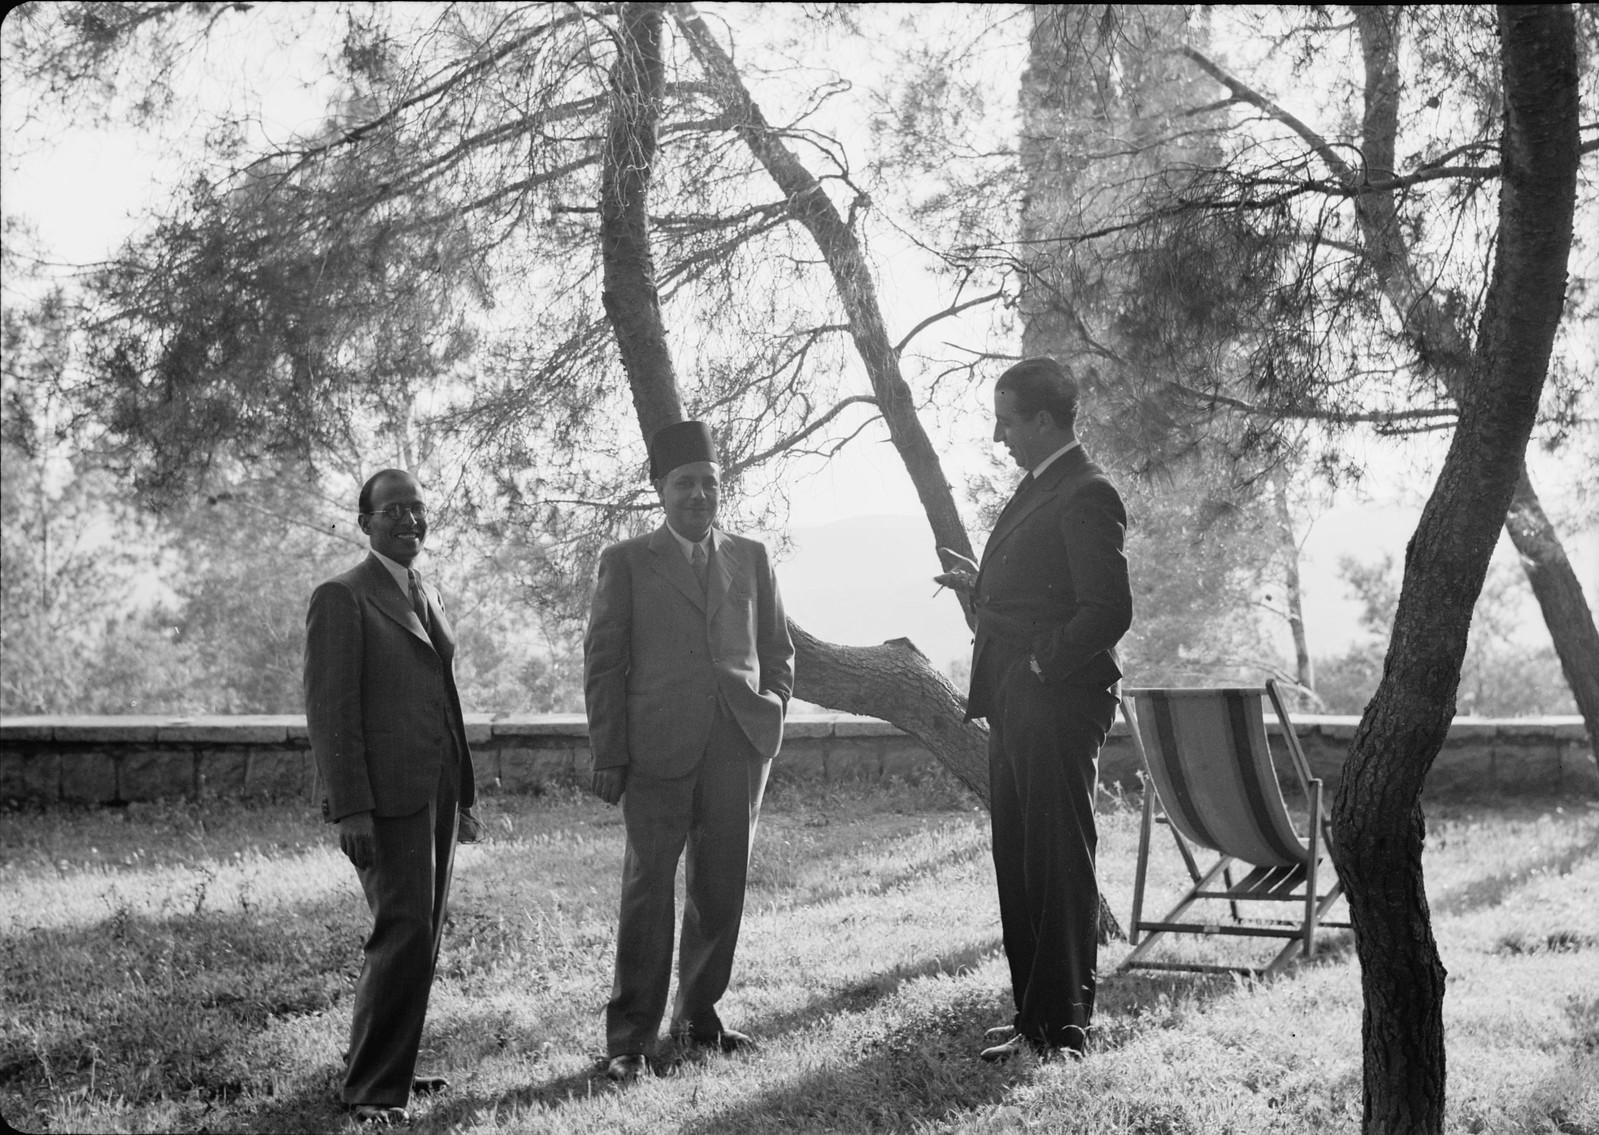 08. Вице-консул Египта, г-н Лабабиди и т. д